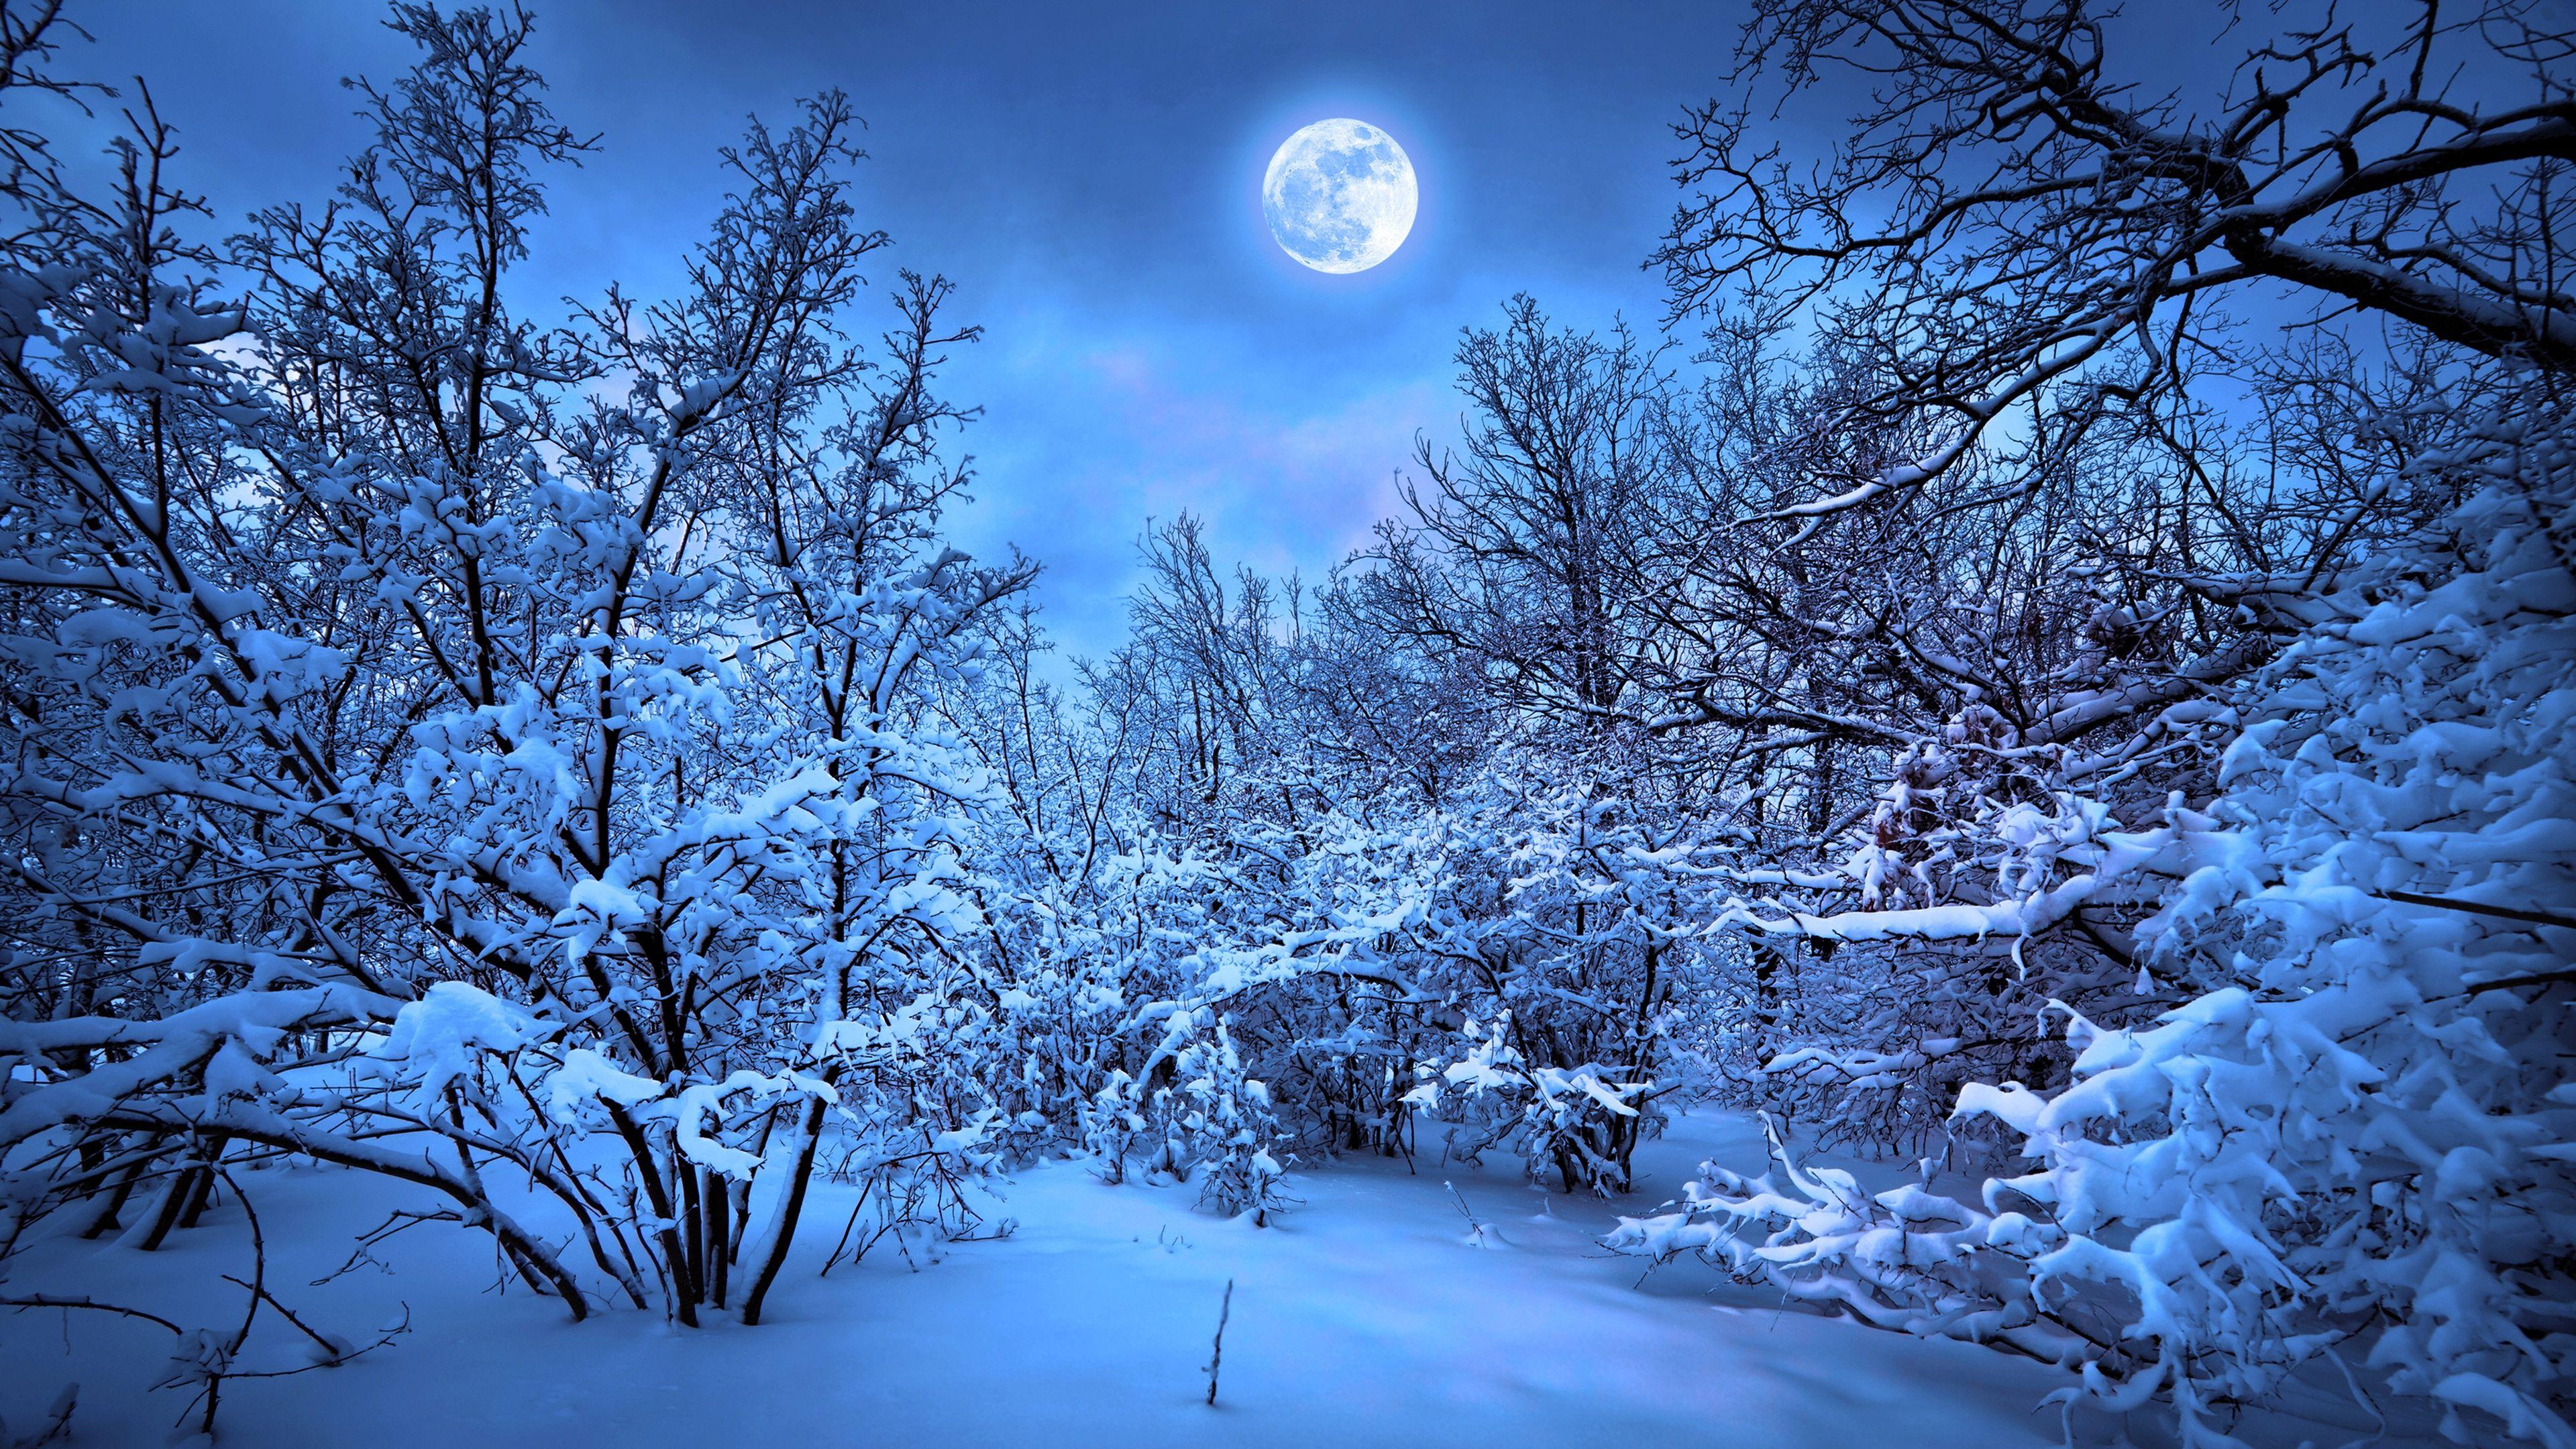 Earth Moon Attractive Wallpaper 88660 14297749702 Jpg 3840 2160